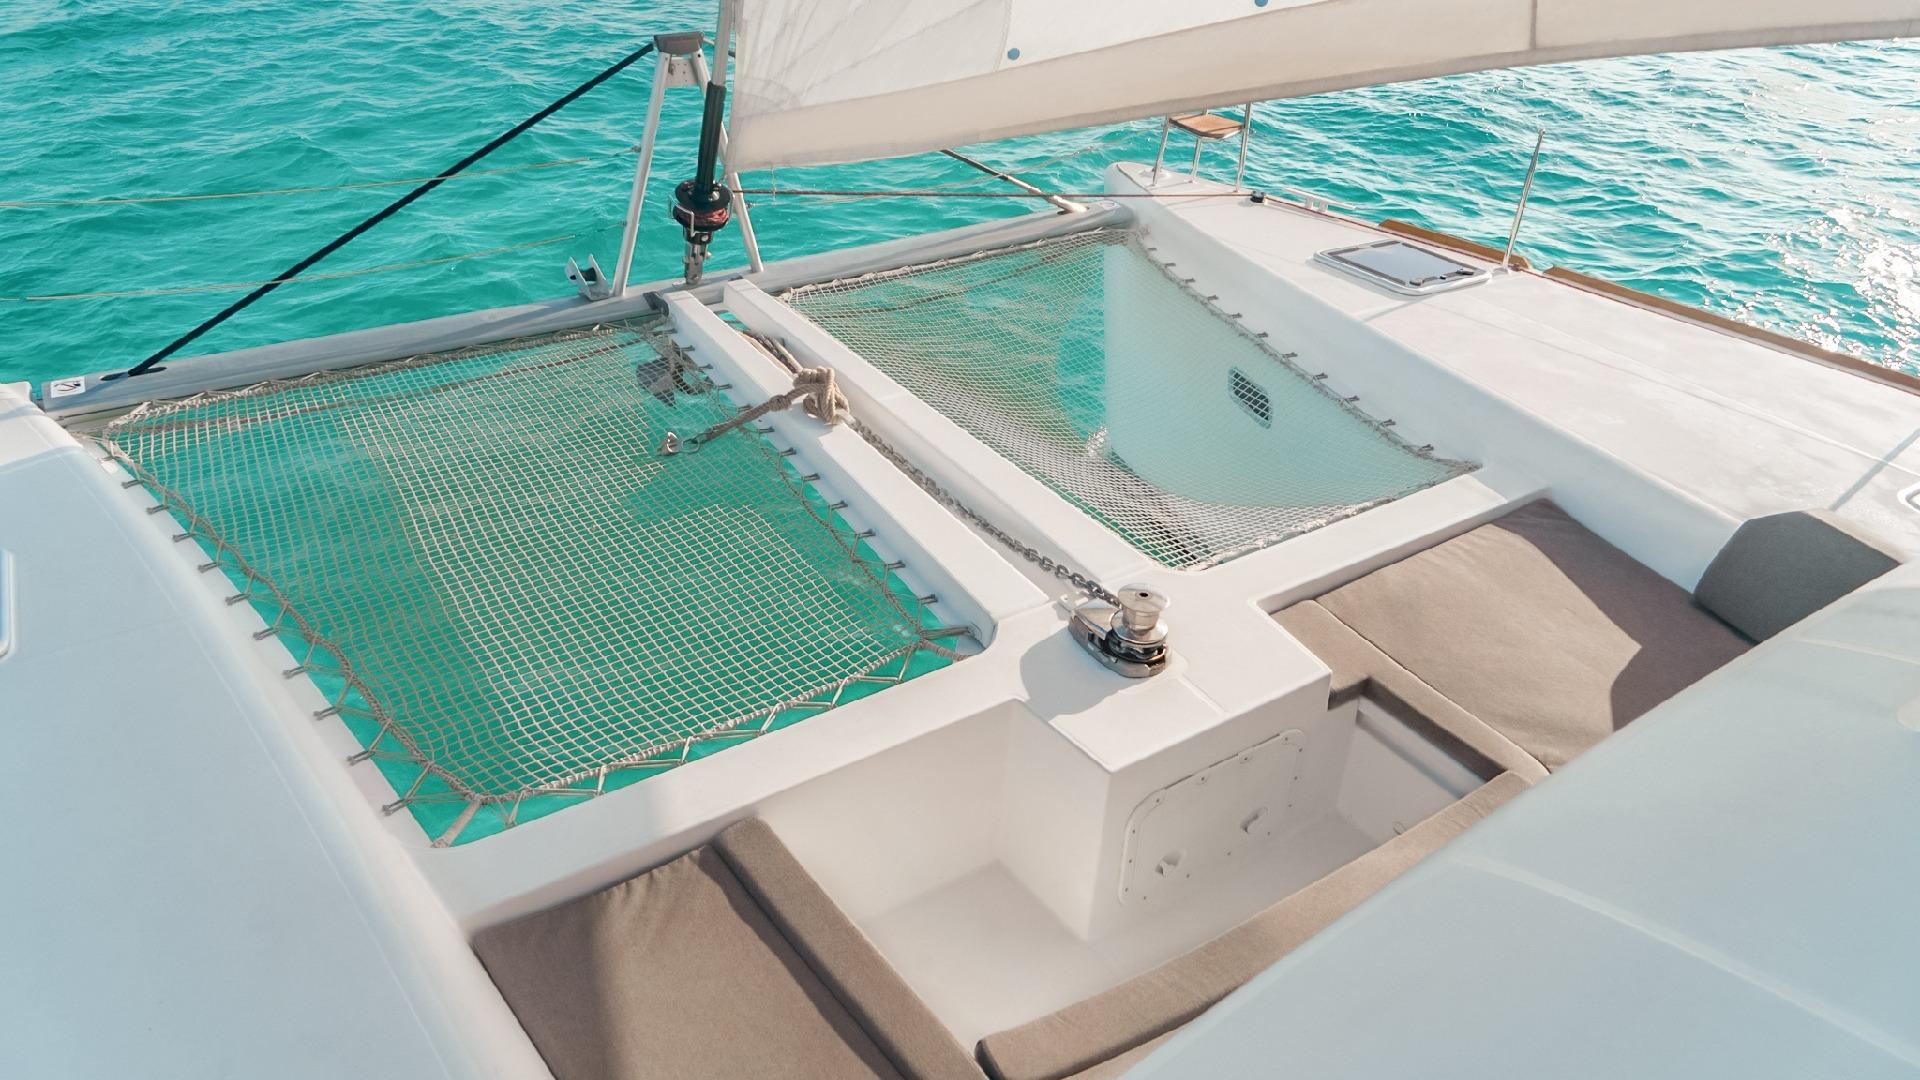 4 - LowRes - Lohengrin - Private tour to Isla Mujeres in catamaran - Cancun Sailing